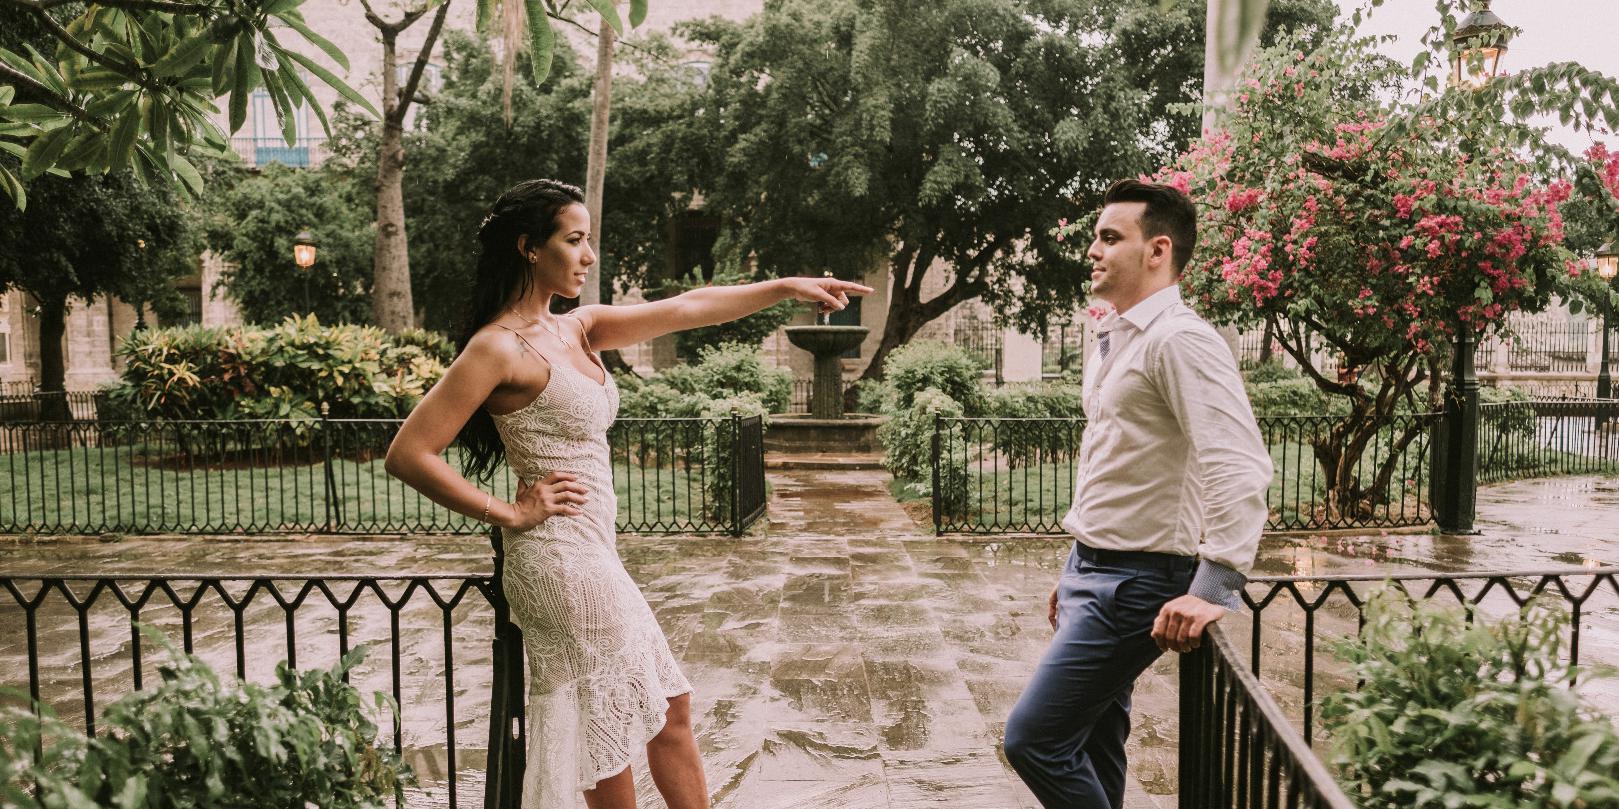 bodas-sin-clasificar-sin-tema-cuba-35271.jpg